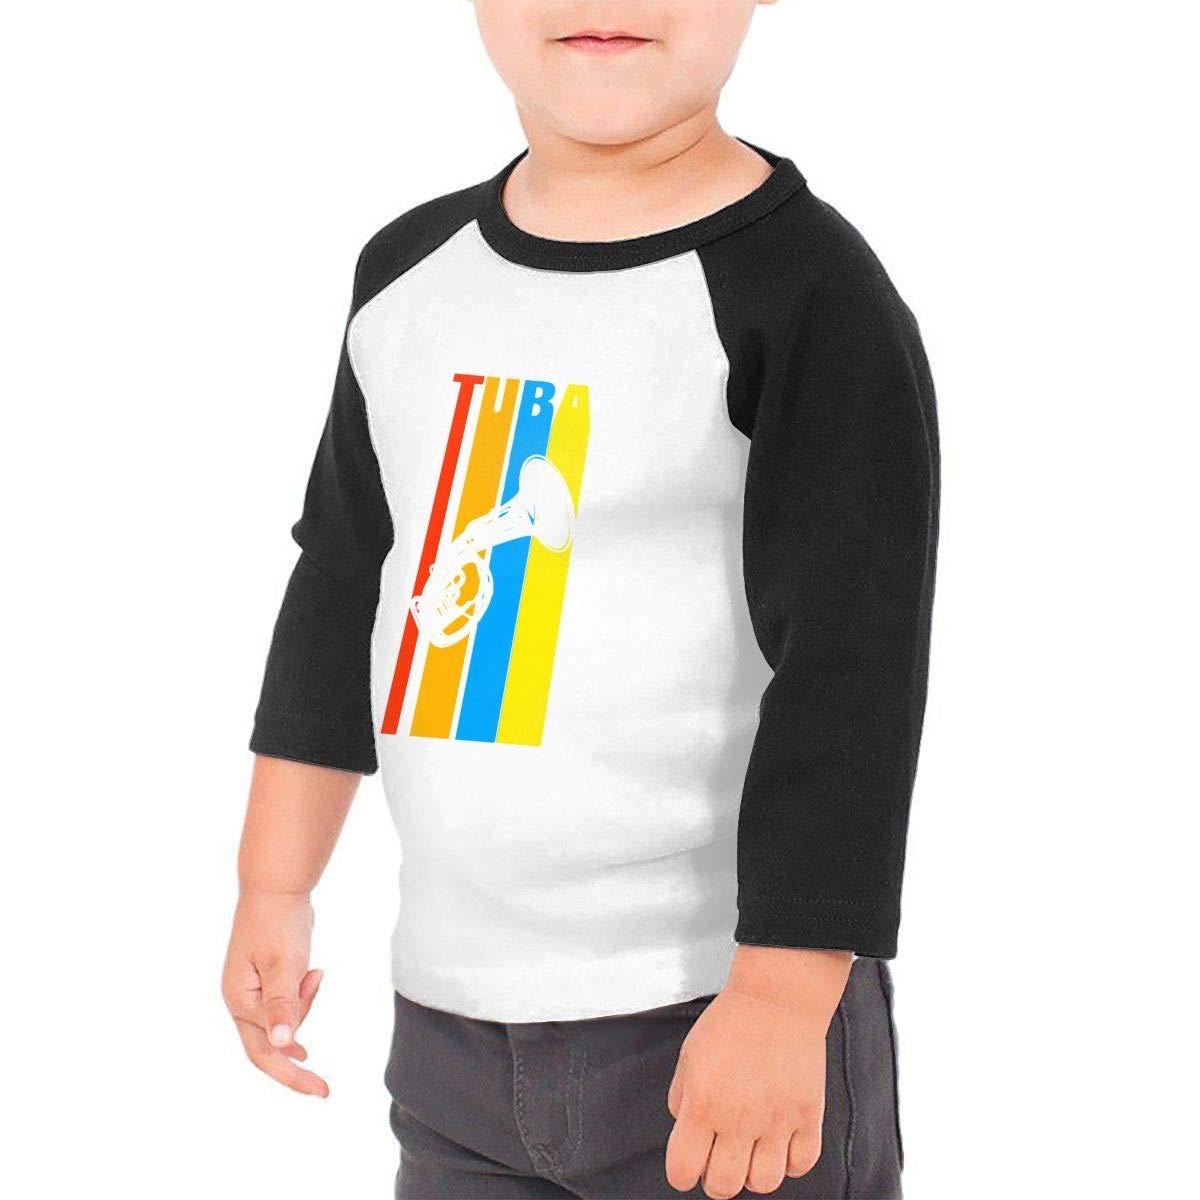 Tuba Classic Vintage Retro Unisex 100/% Cotton Childrens 3//4 Sleeves T-Shirt Top Tees 2T~5//6T